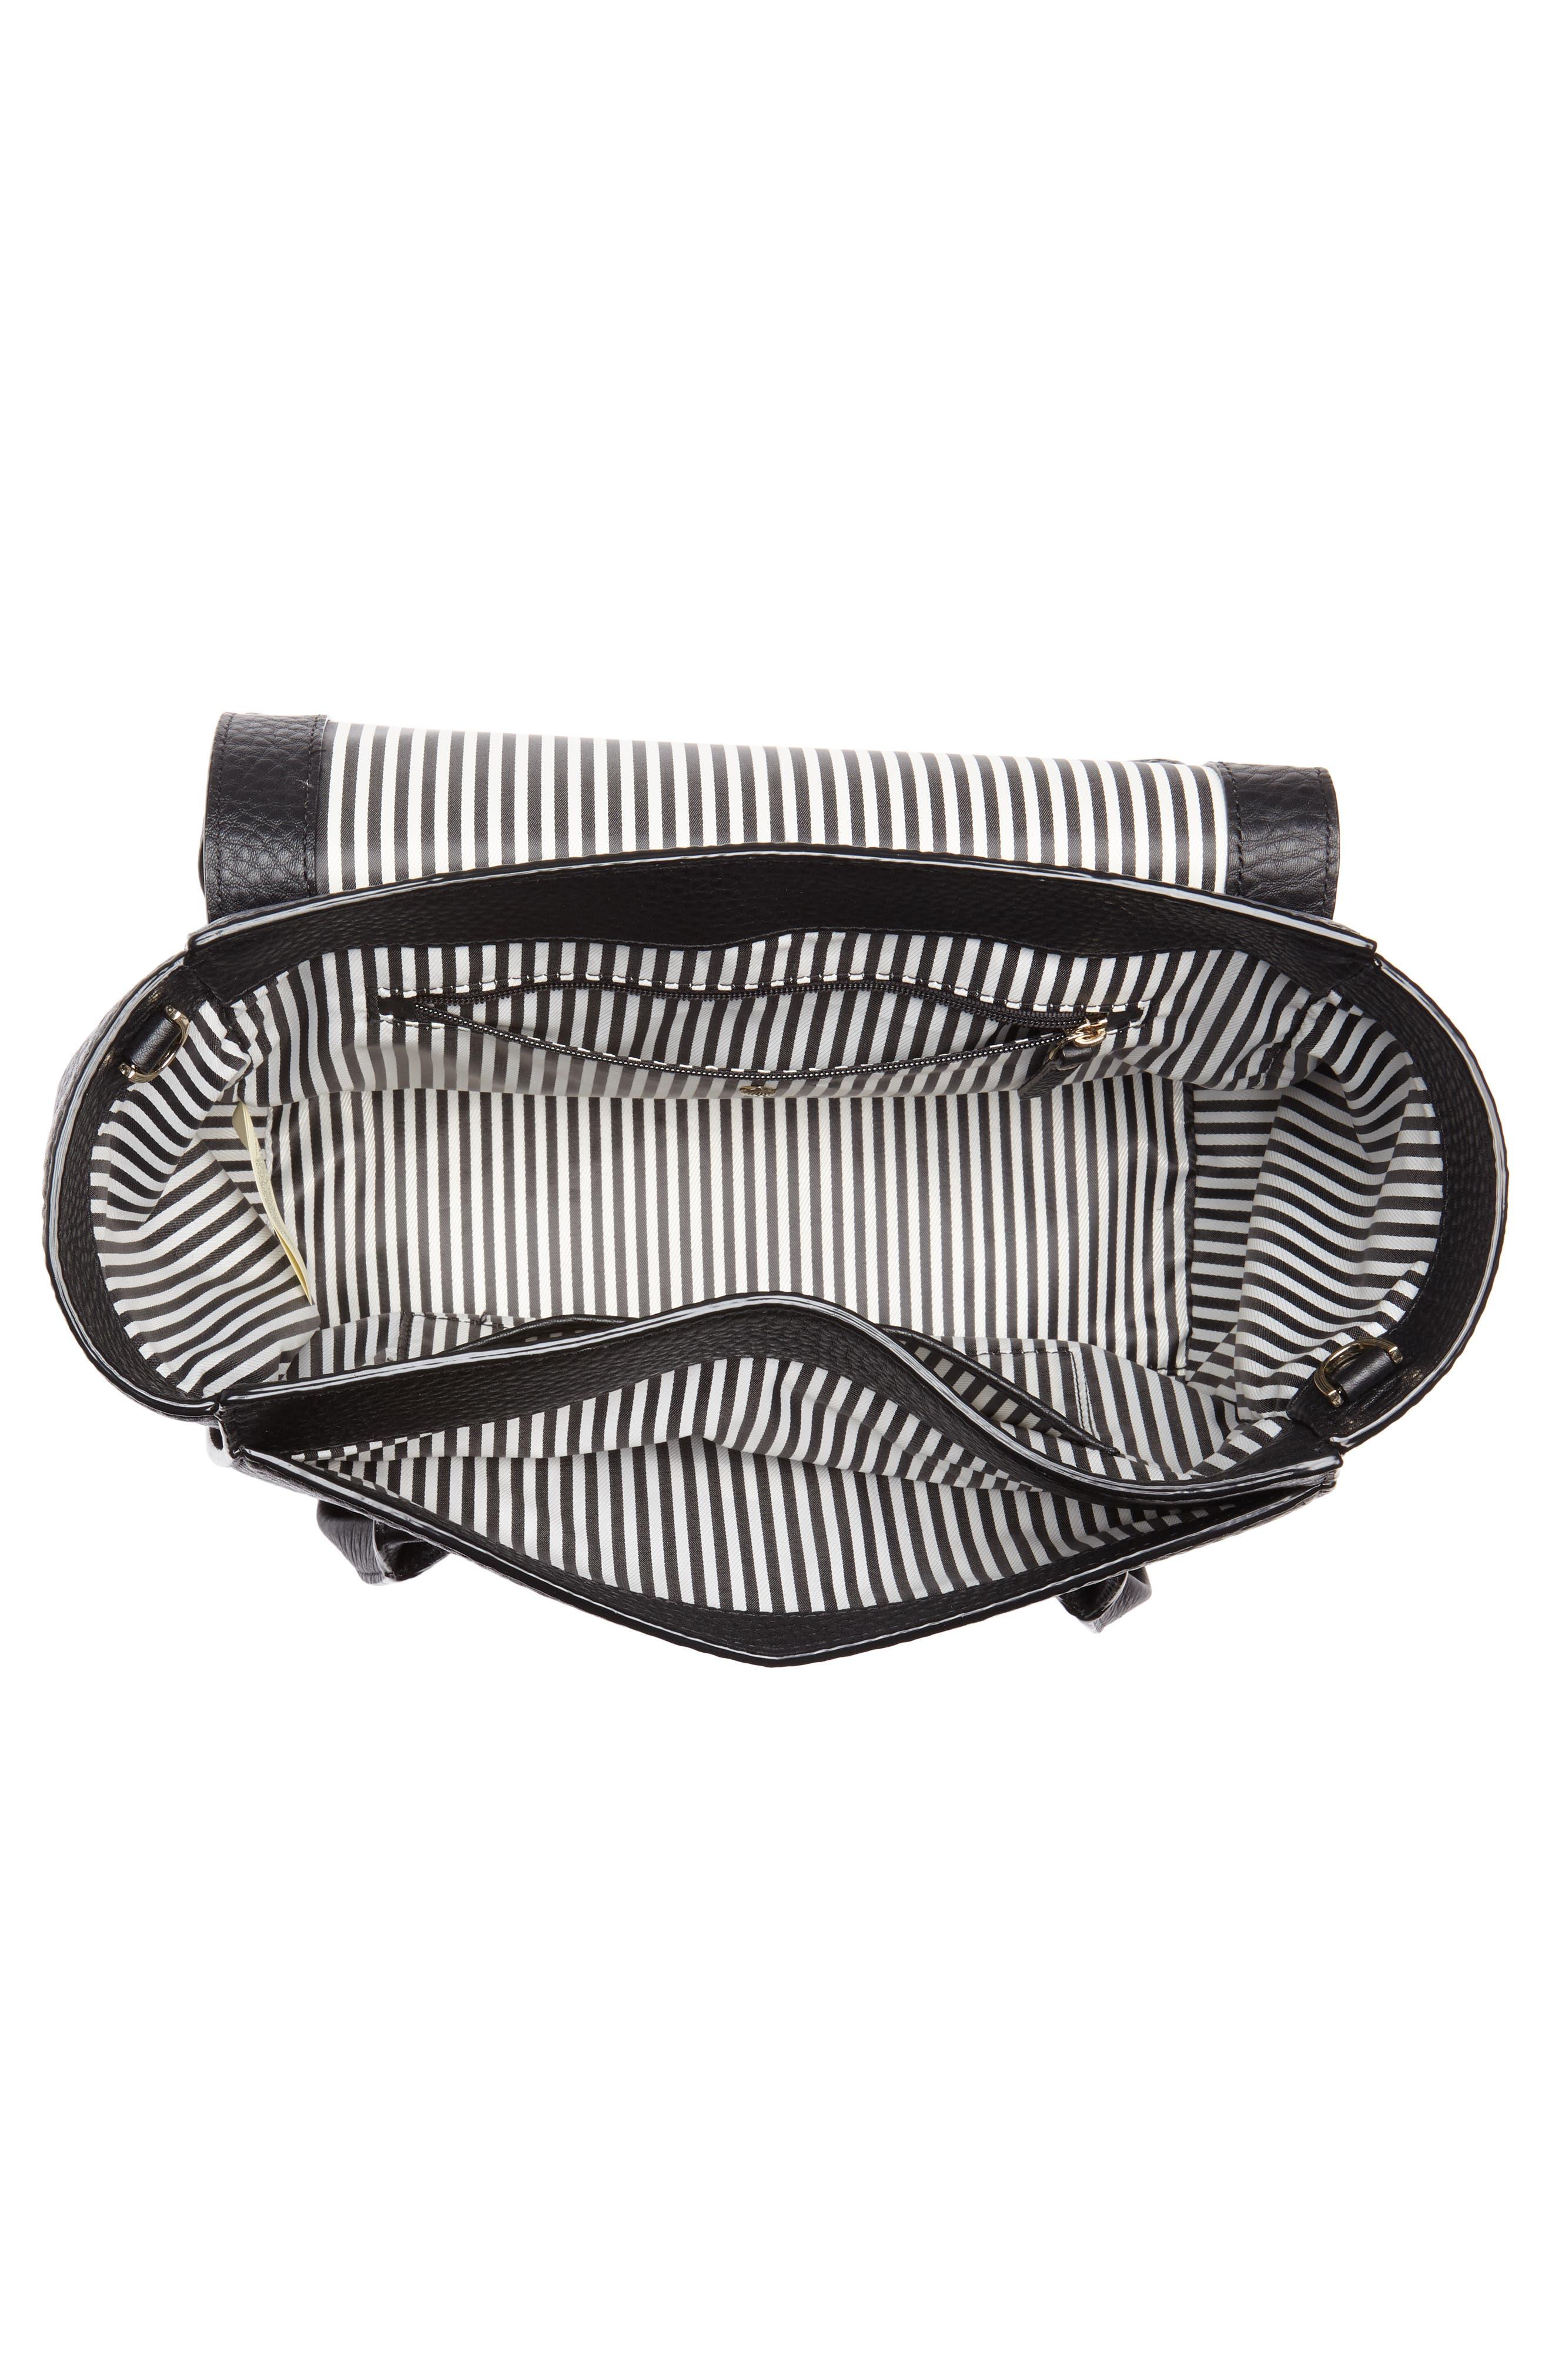 carlyle street - alexa leather satchel,                             Alternate thumbnail 4, color,                             Black